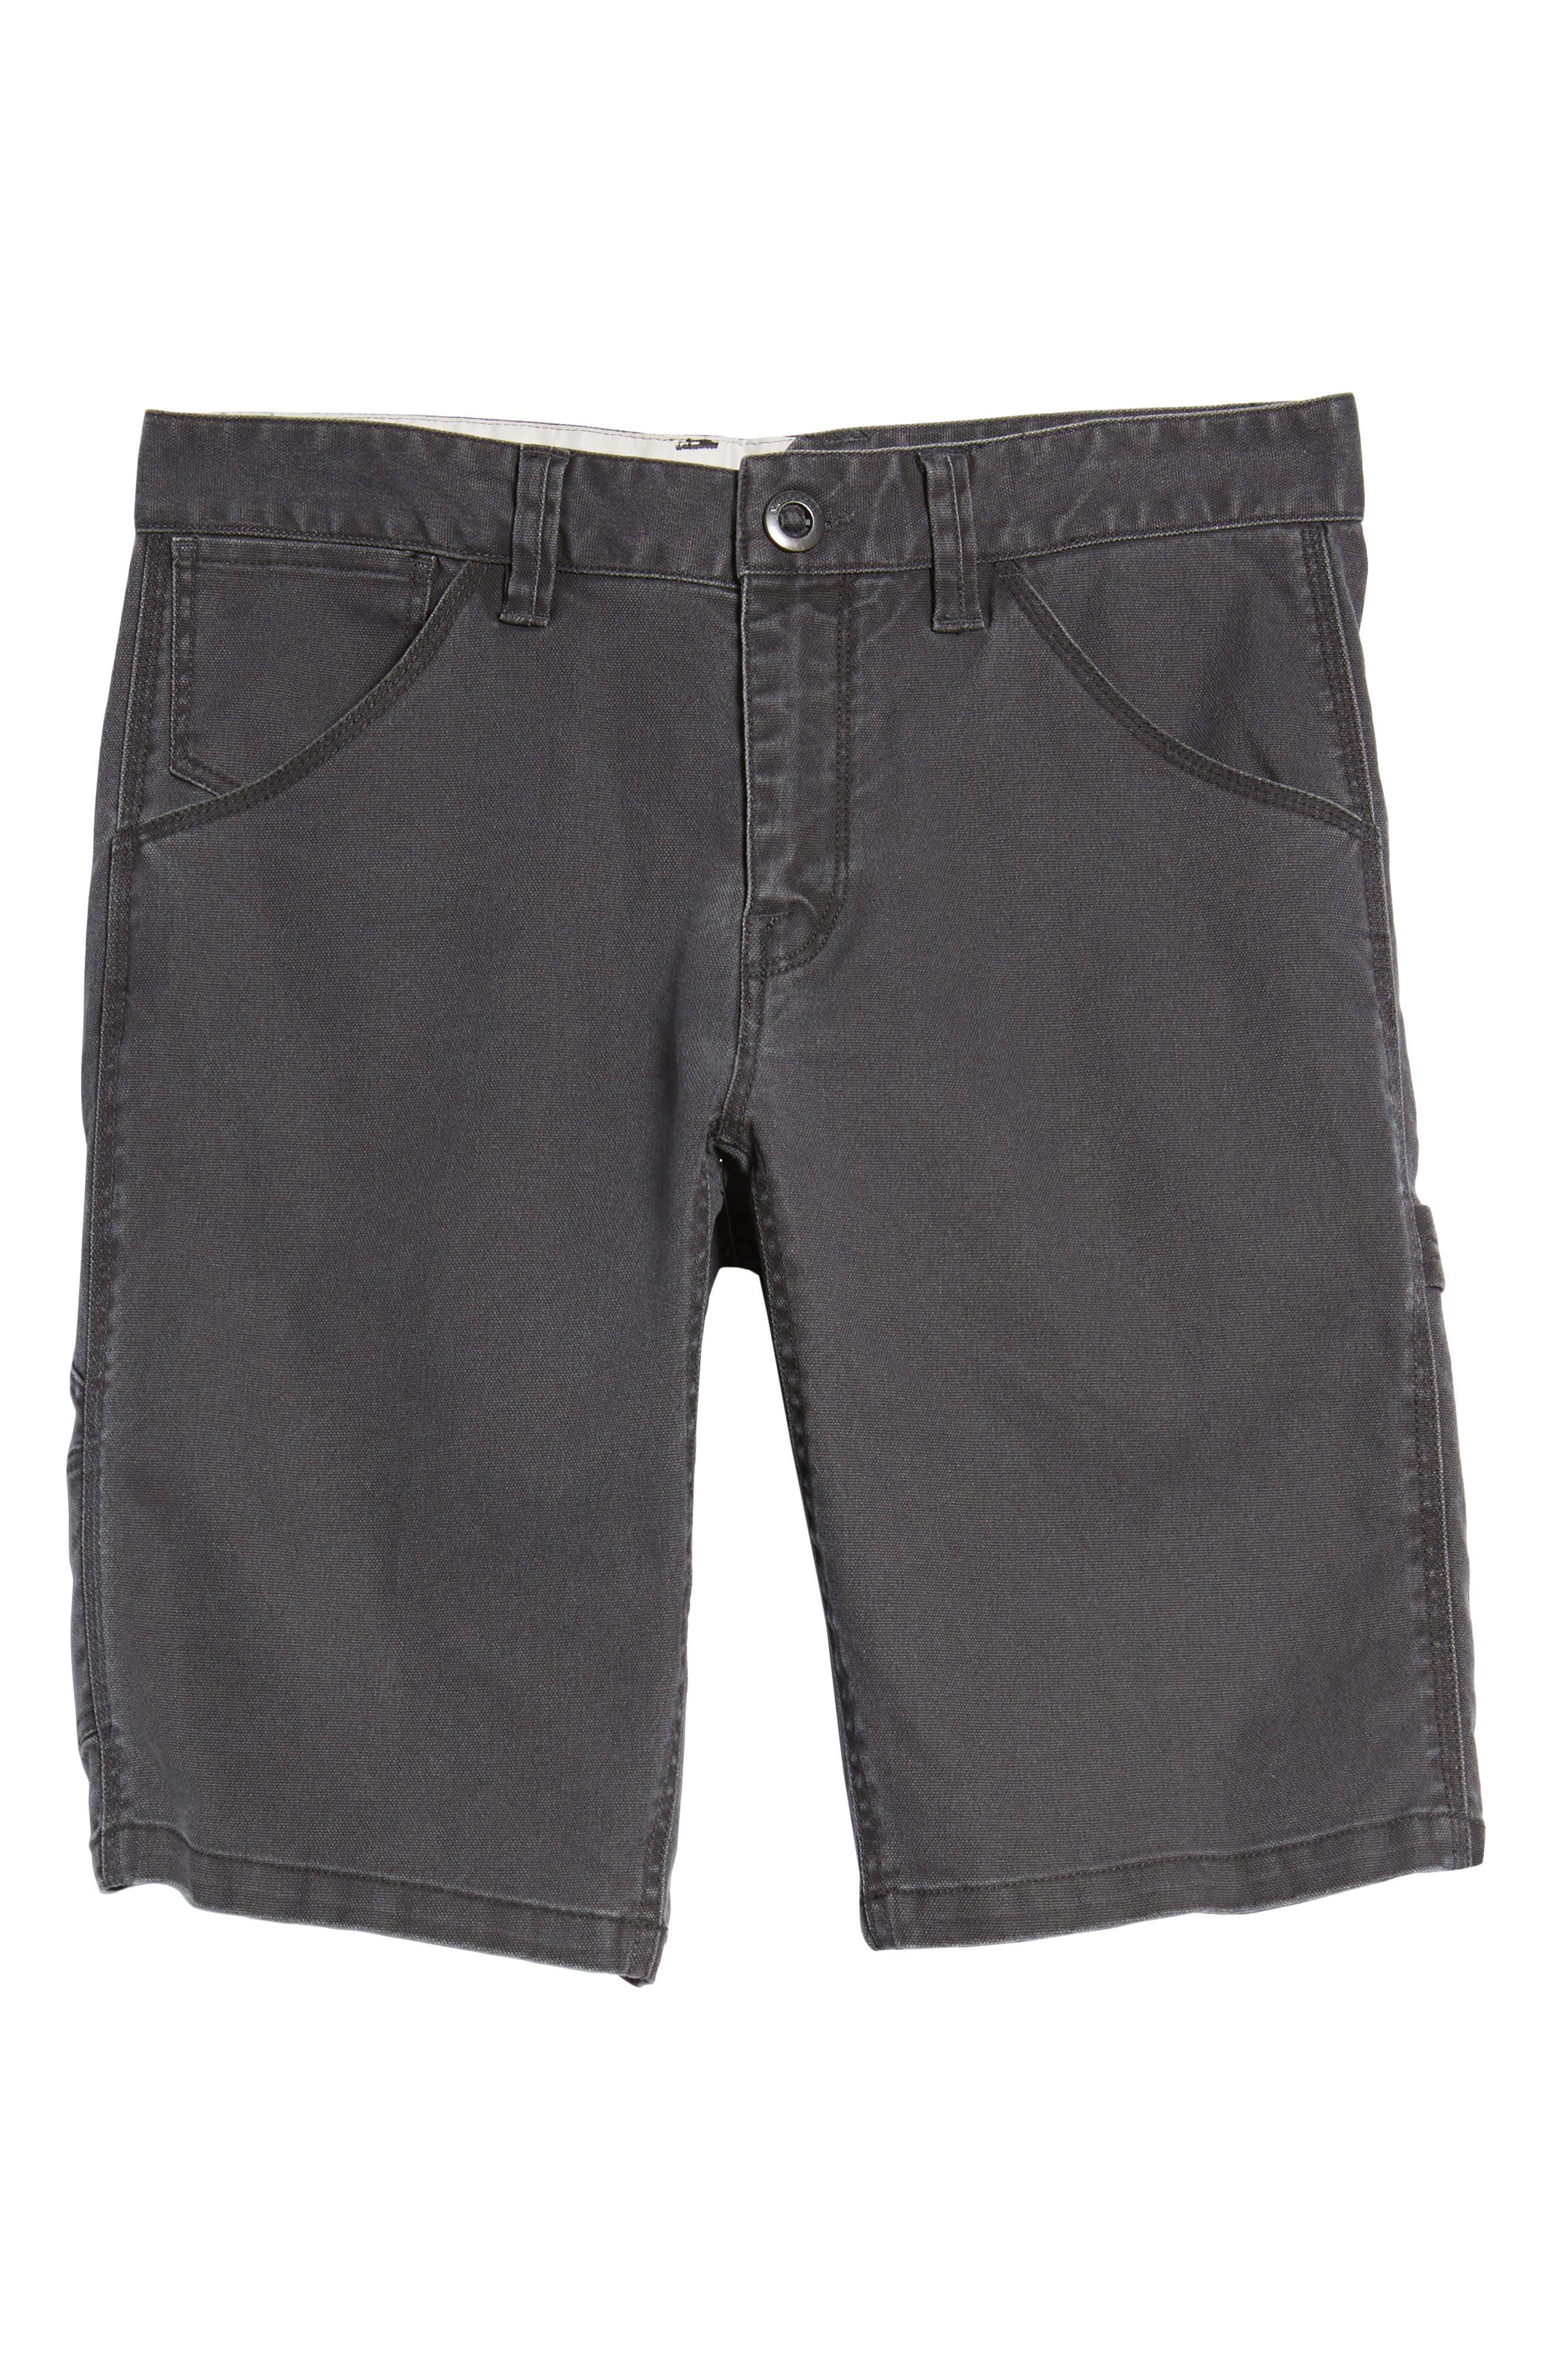 Whaler Utility Shorts,                             Alternate thumbnail 6, color,                             001